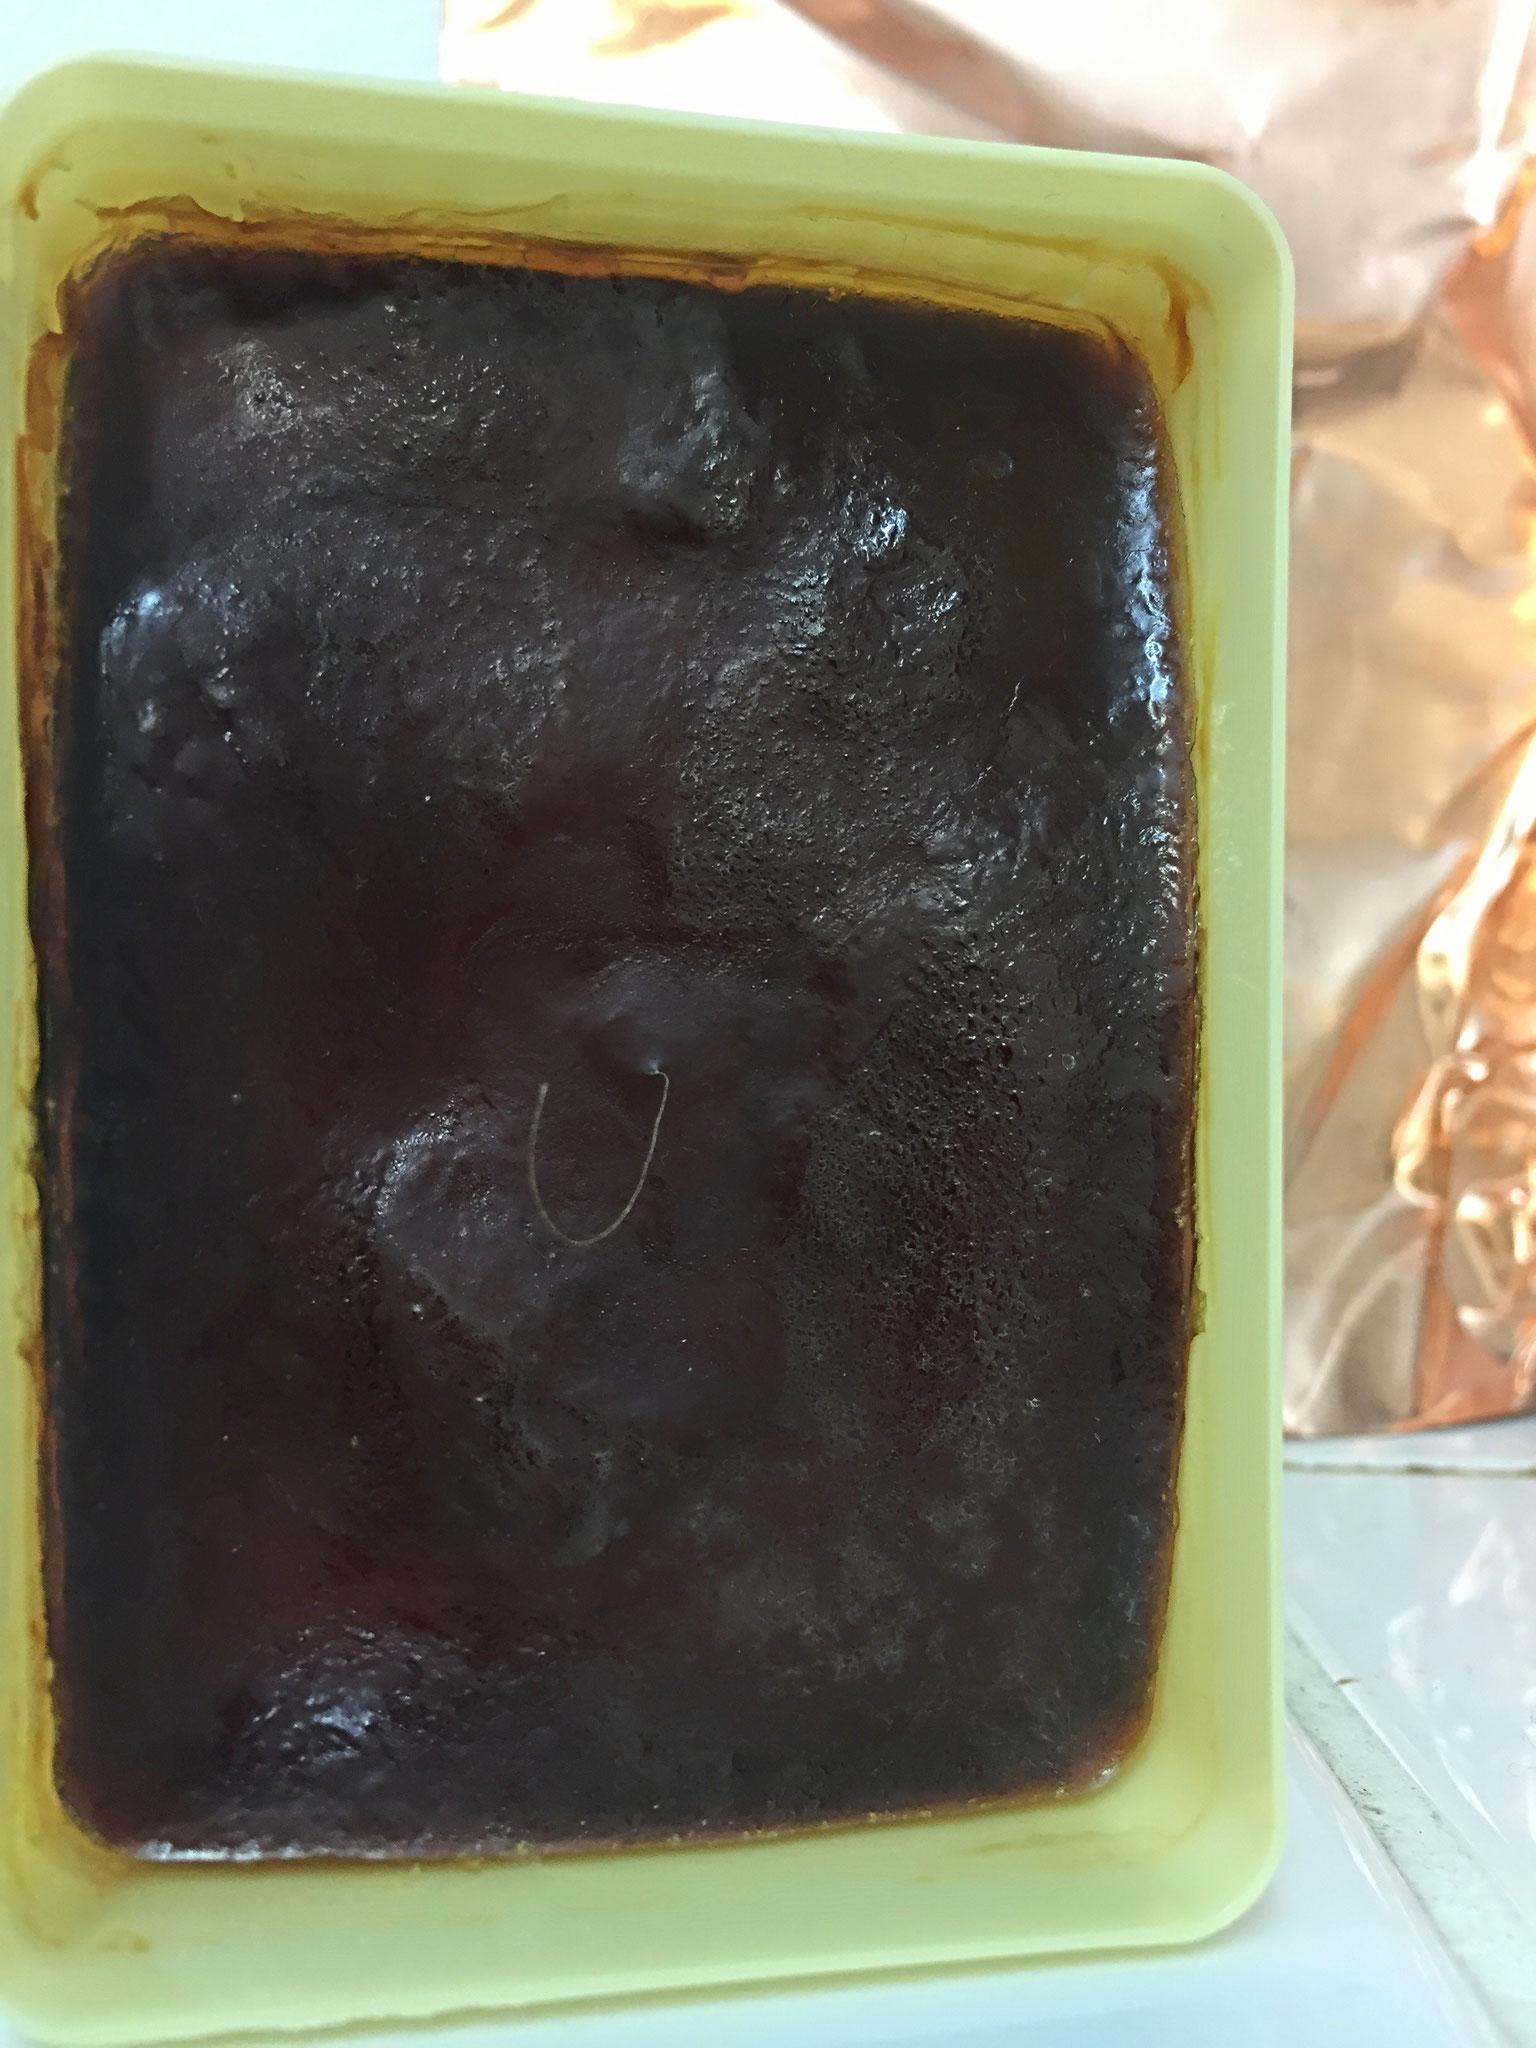 2017 (mixed media, copper, soap box, latex, pubic hair)